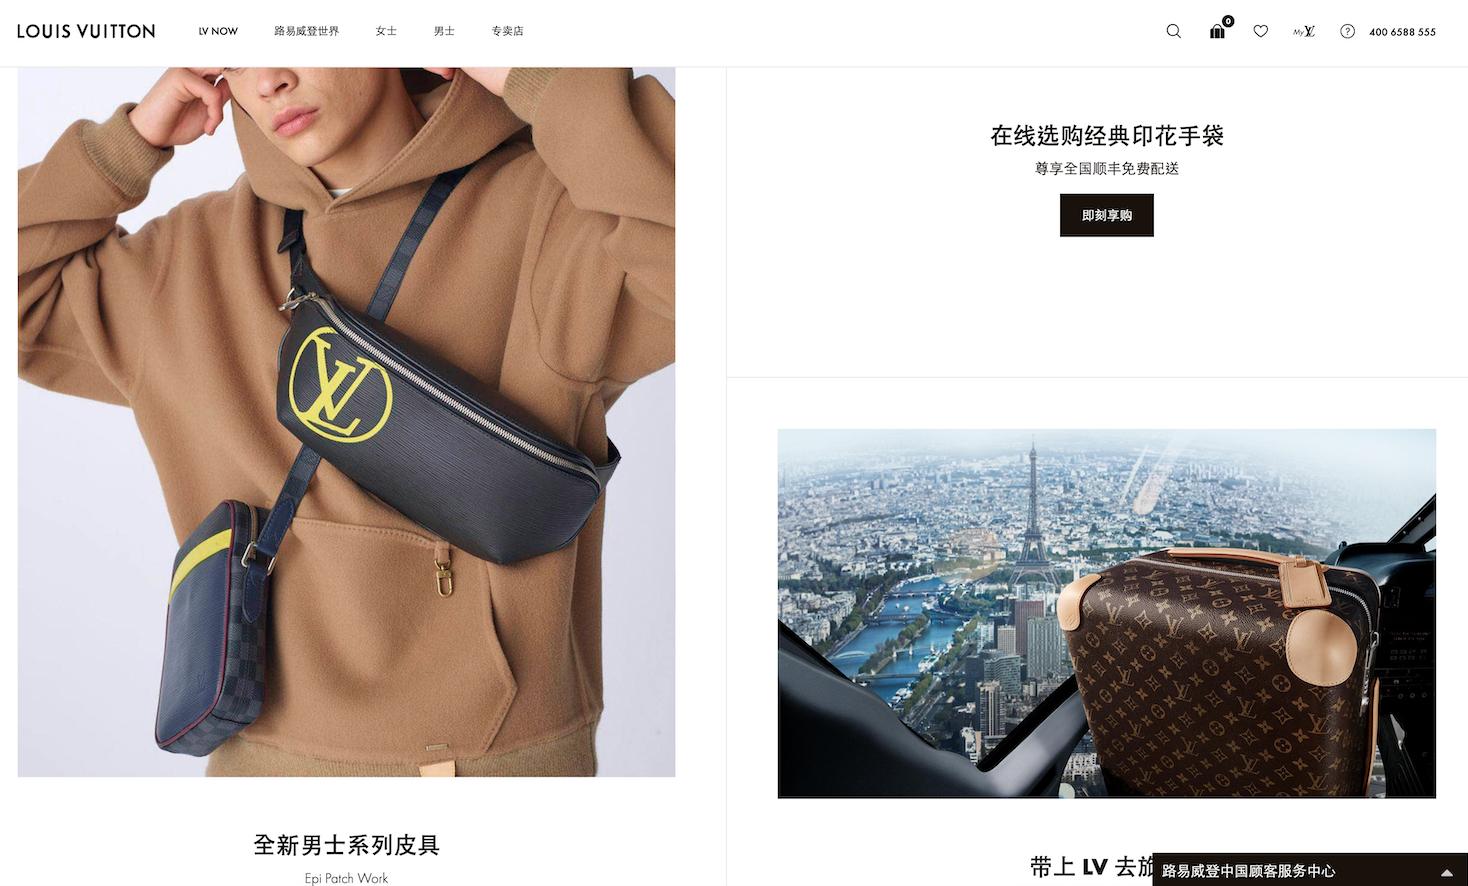 LVMH集团首席财务官披露:Chanel 当前估值已逼近1000亿欧元,谁买都不容易!